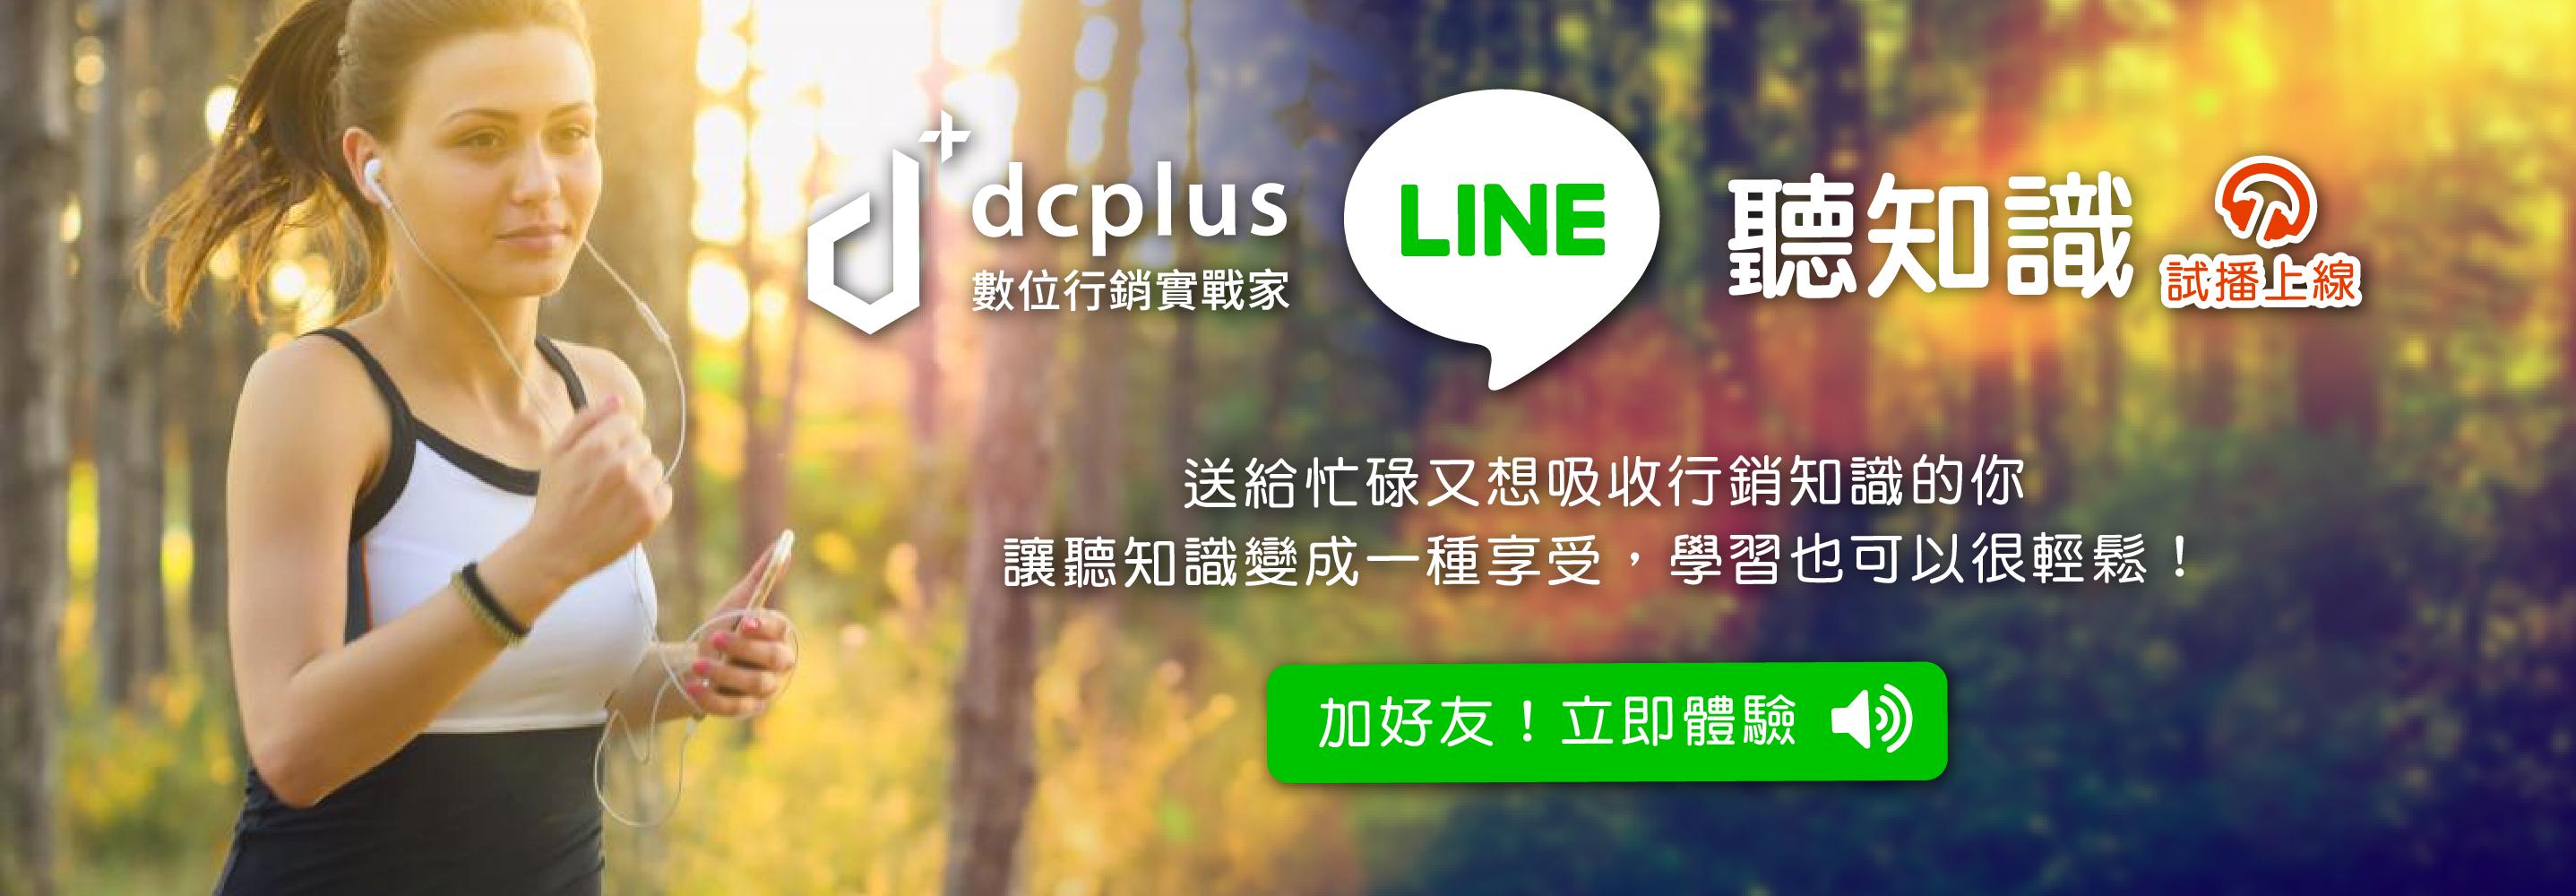 dcplus LINE@ 聽知識